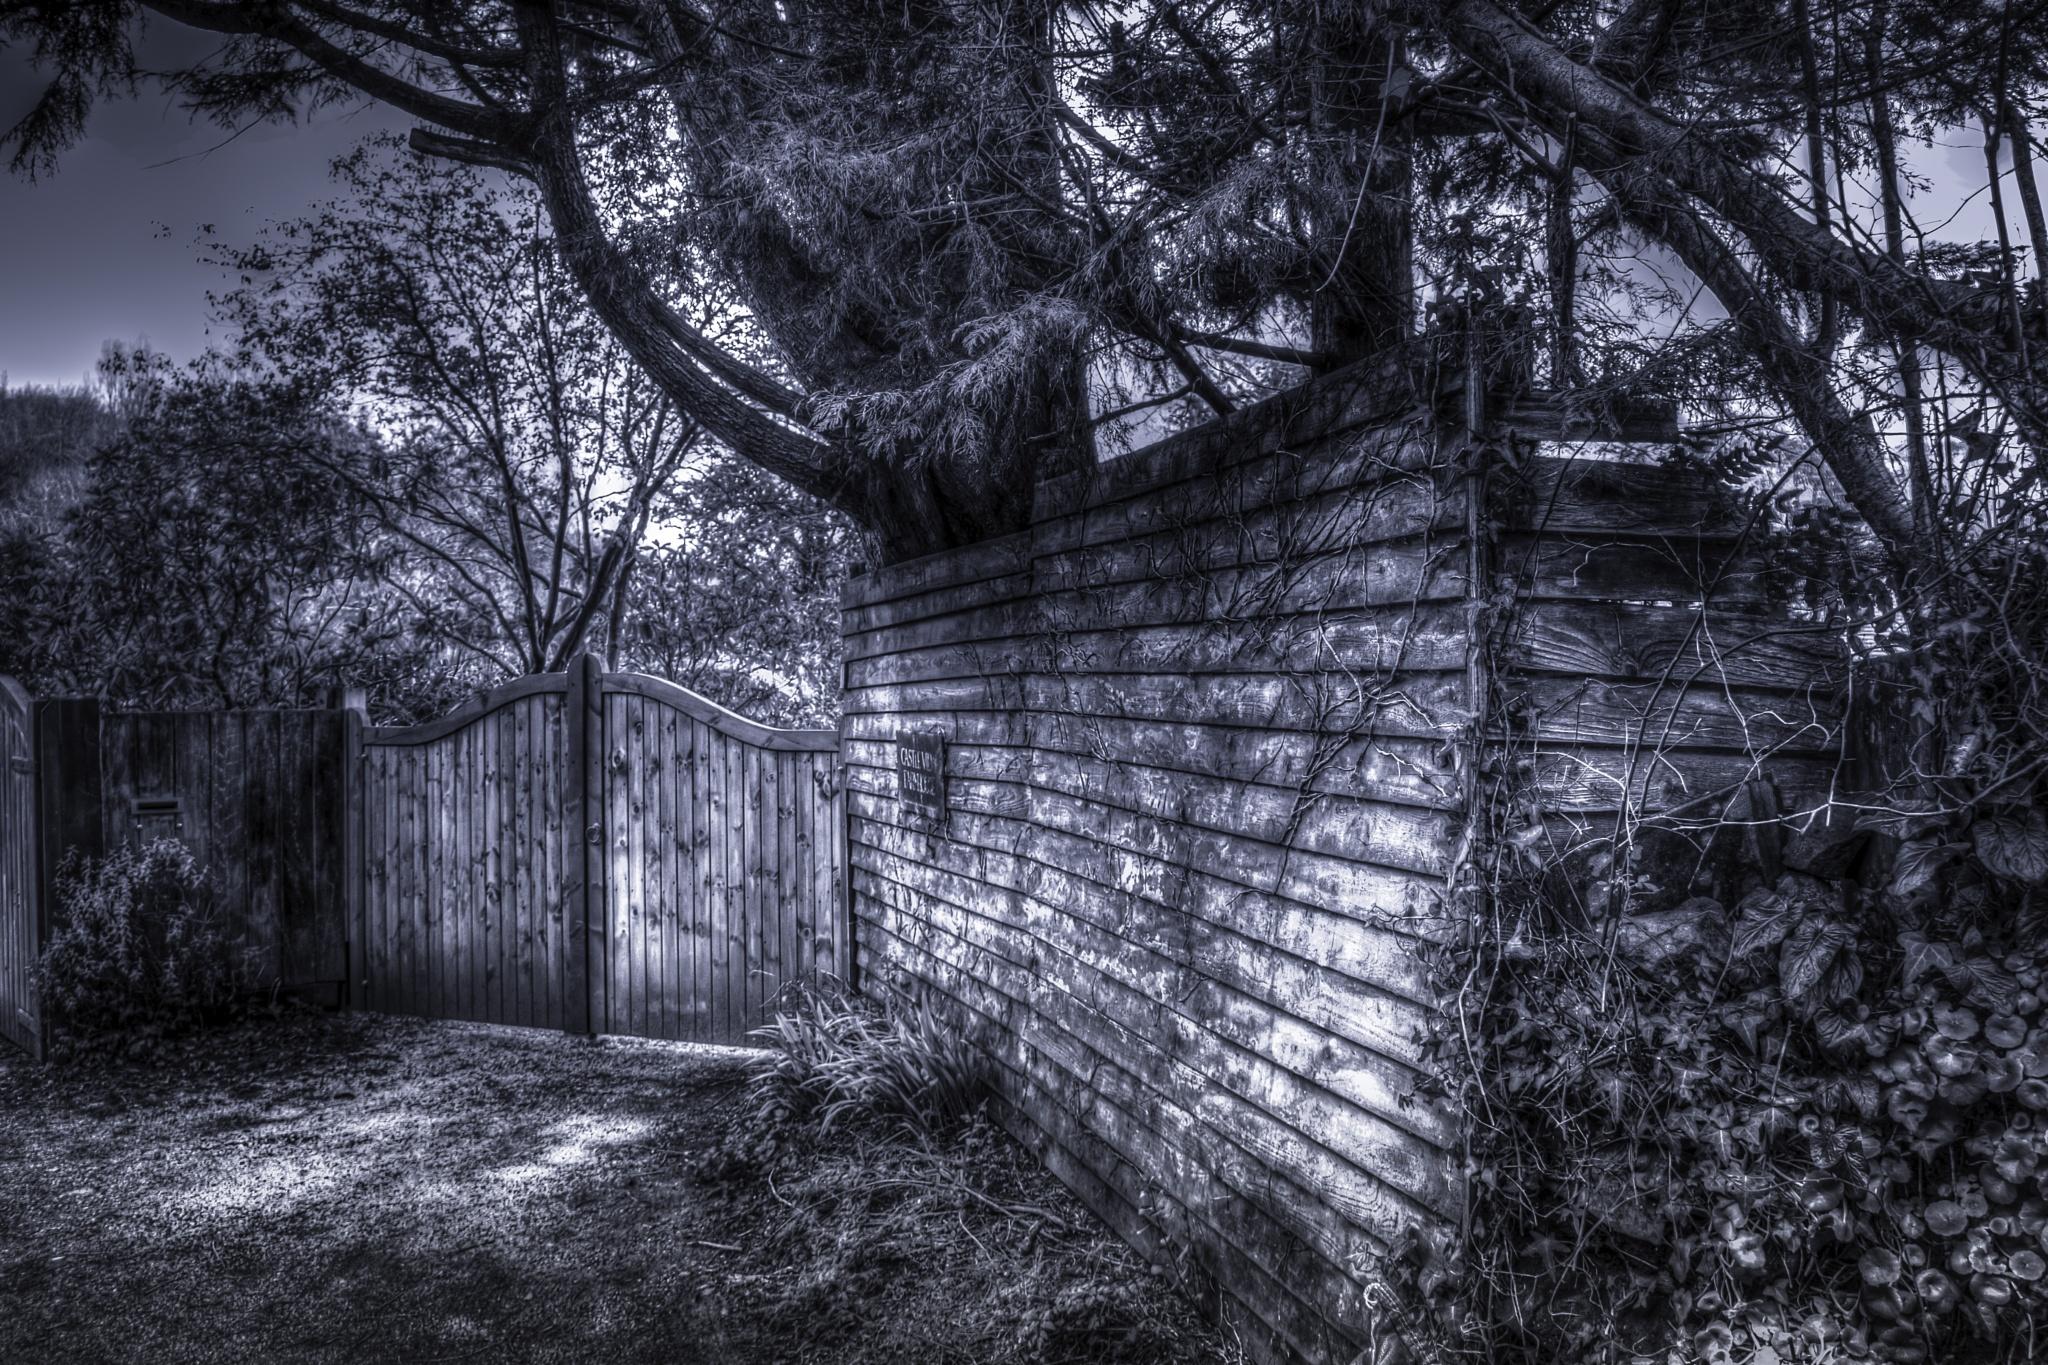 secret gate by phillip ticehurst